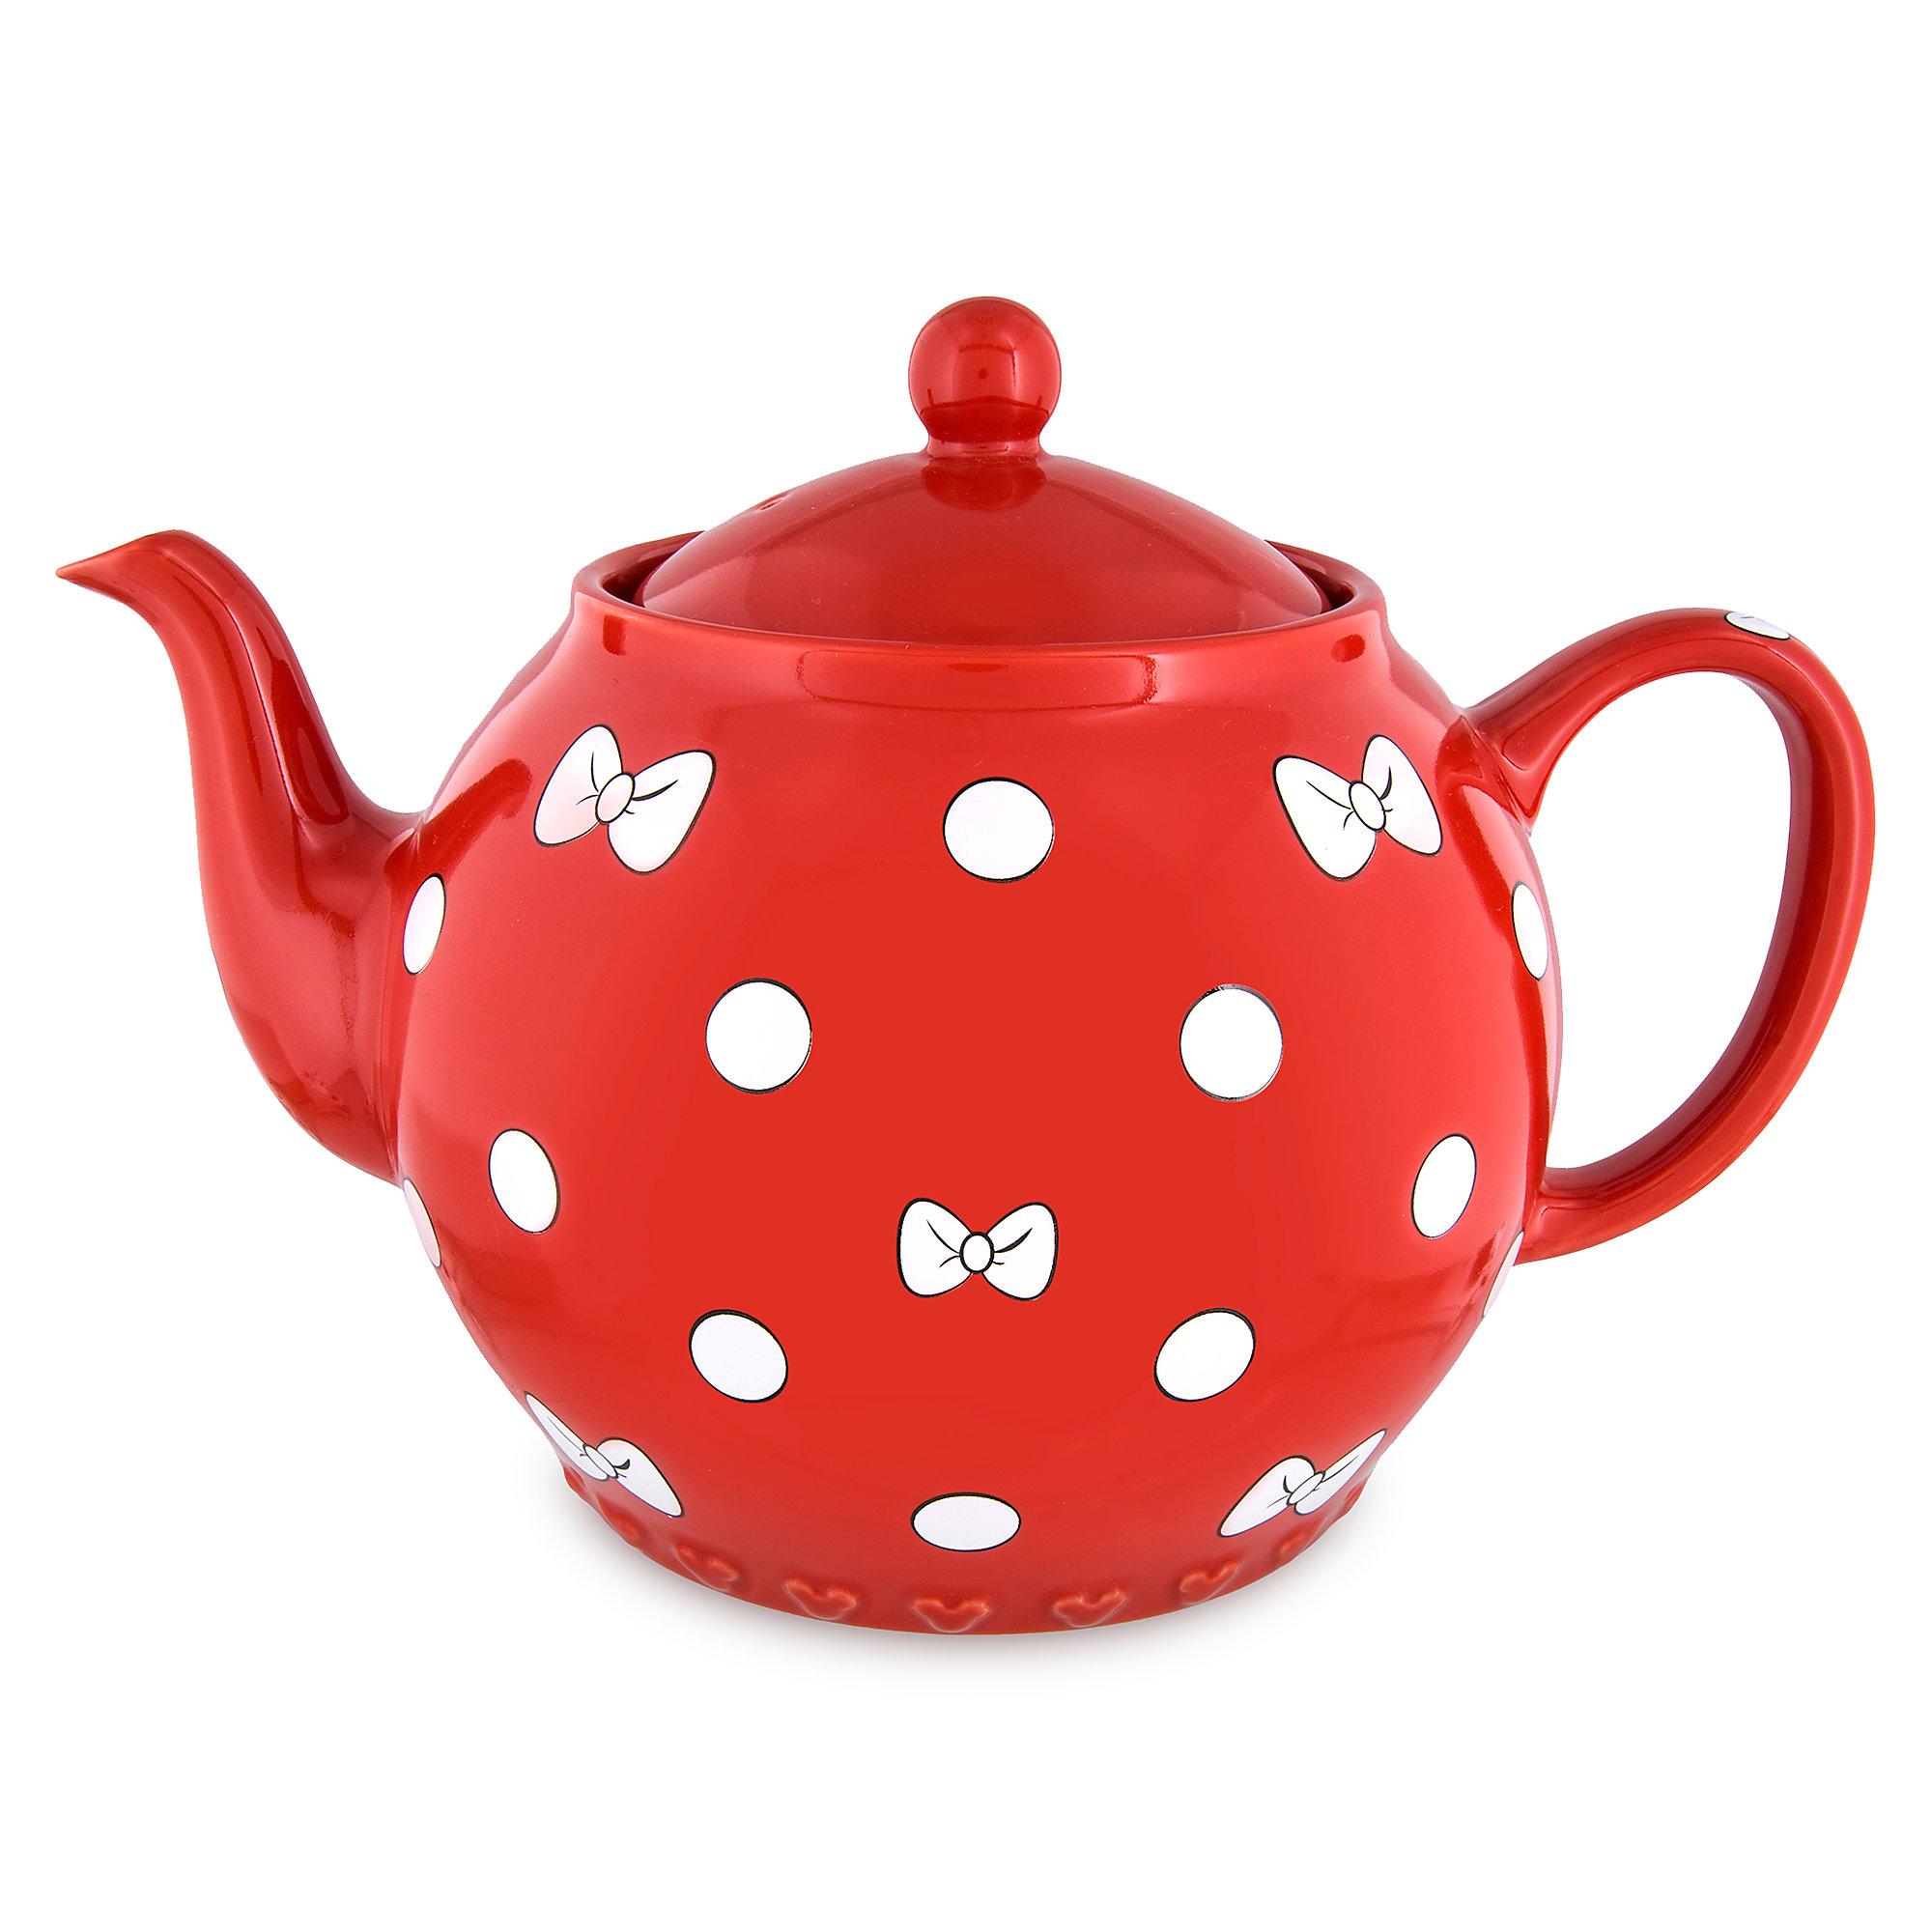 2000x2000 Minnie Mouse Bow Teapot Shopdisney